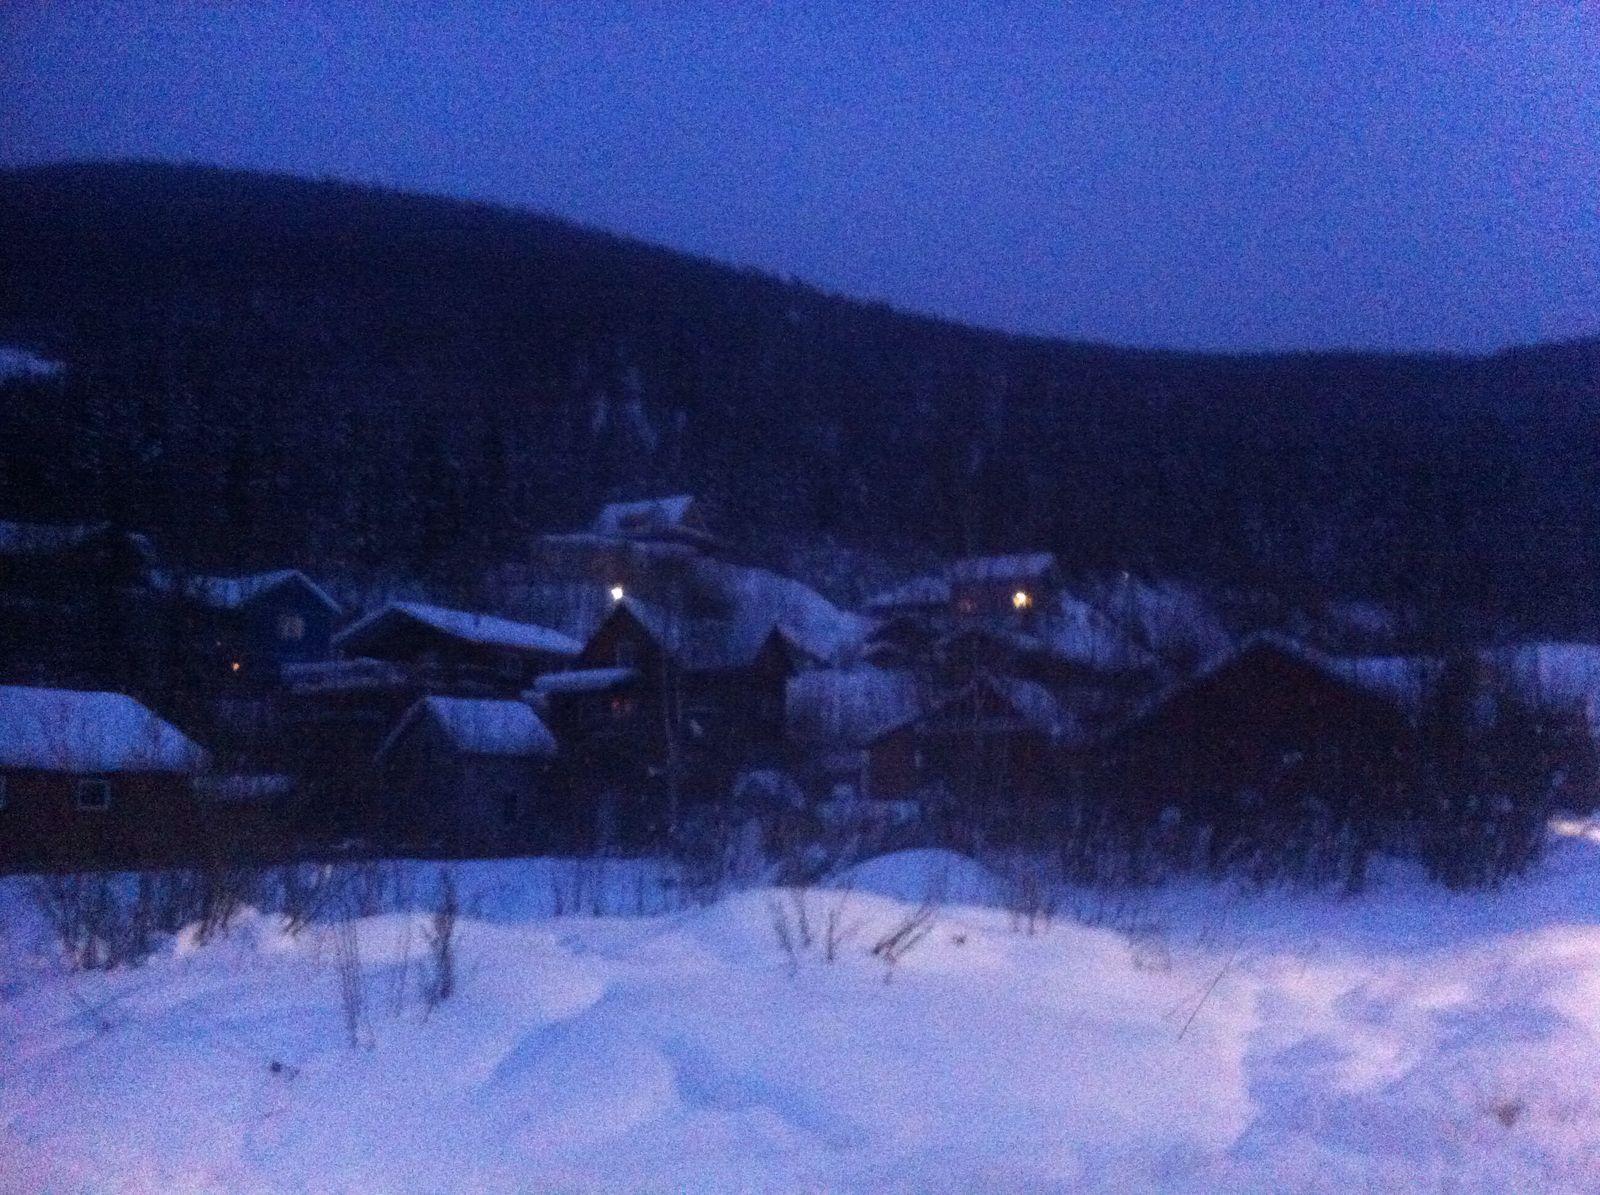 Back to Dawson City to prepare the gold mining season of 2018!